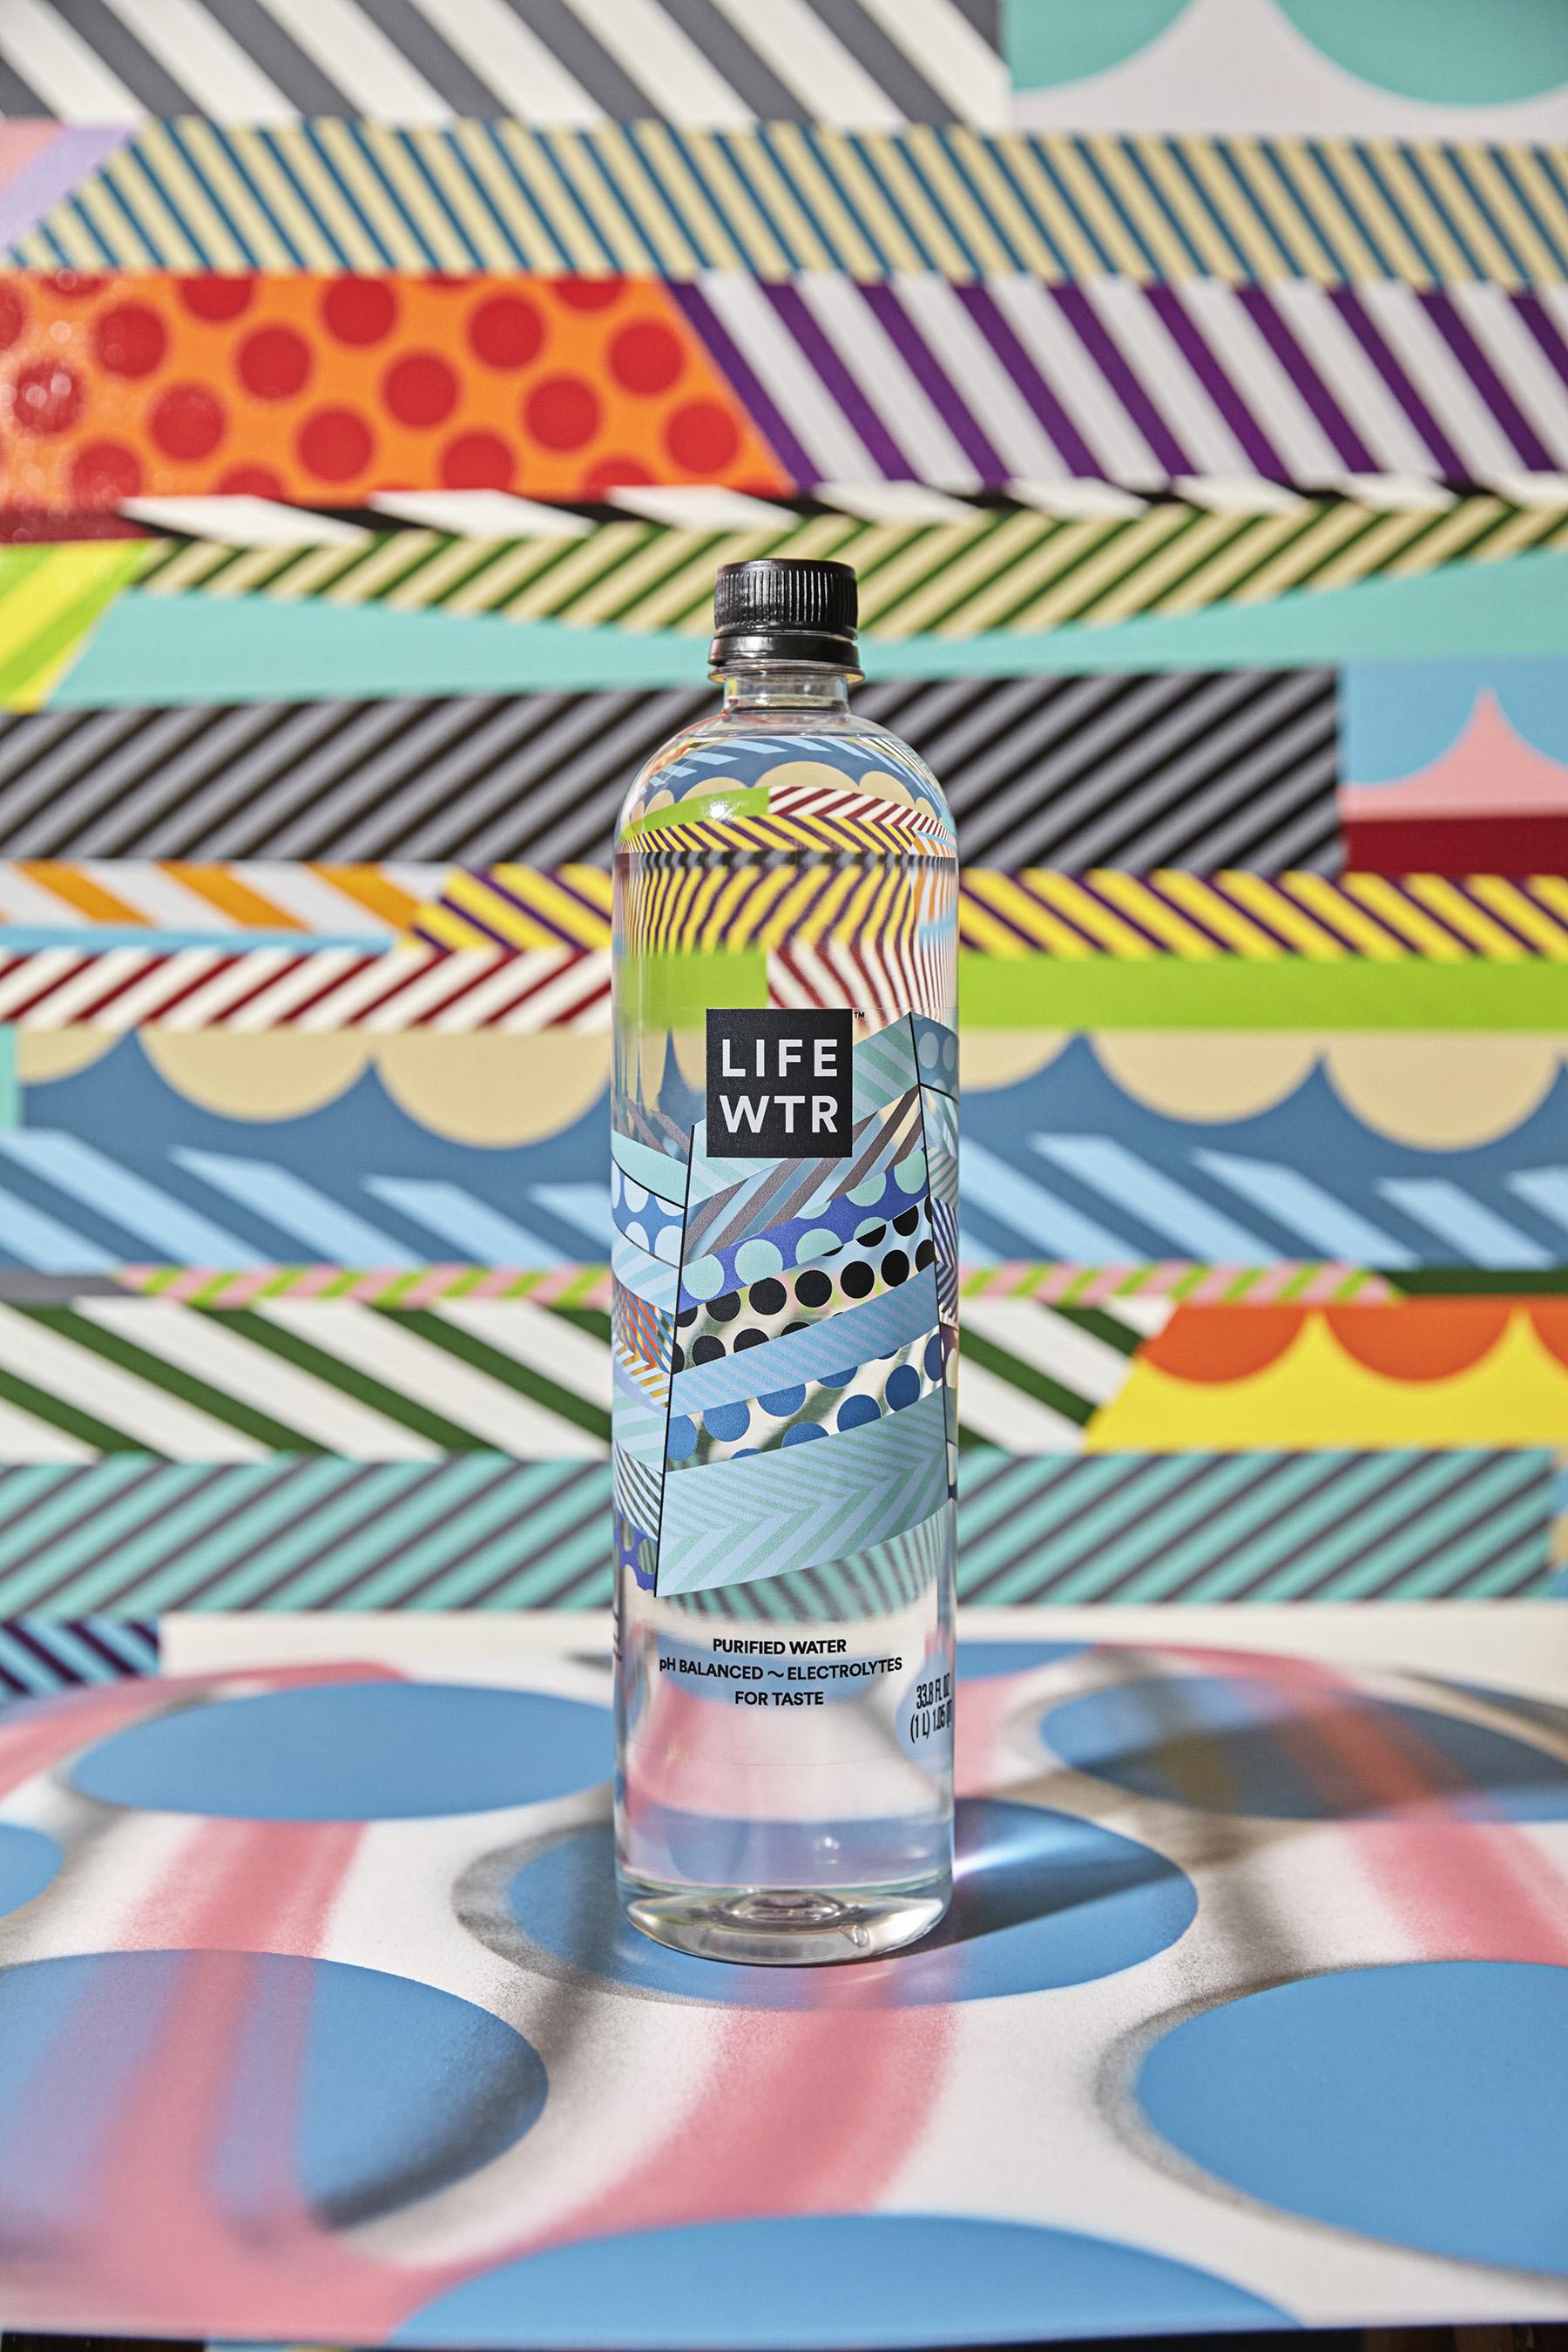 lifewtr-label-design-by-series-1-artist-jason-woodside-41-HR.jpg